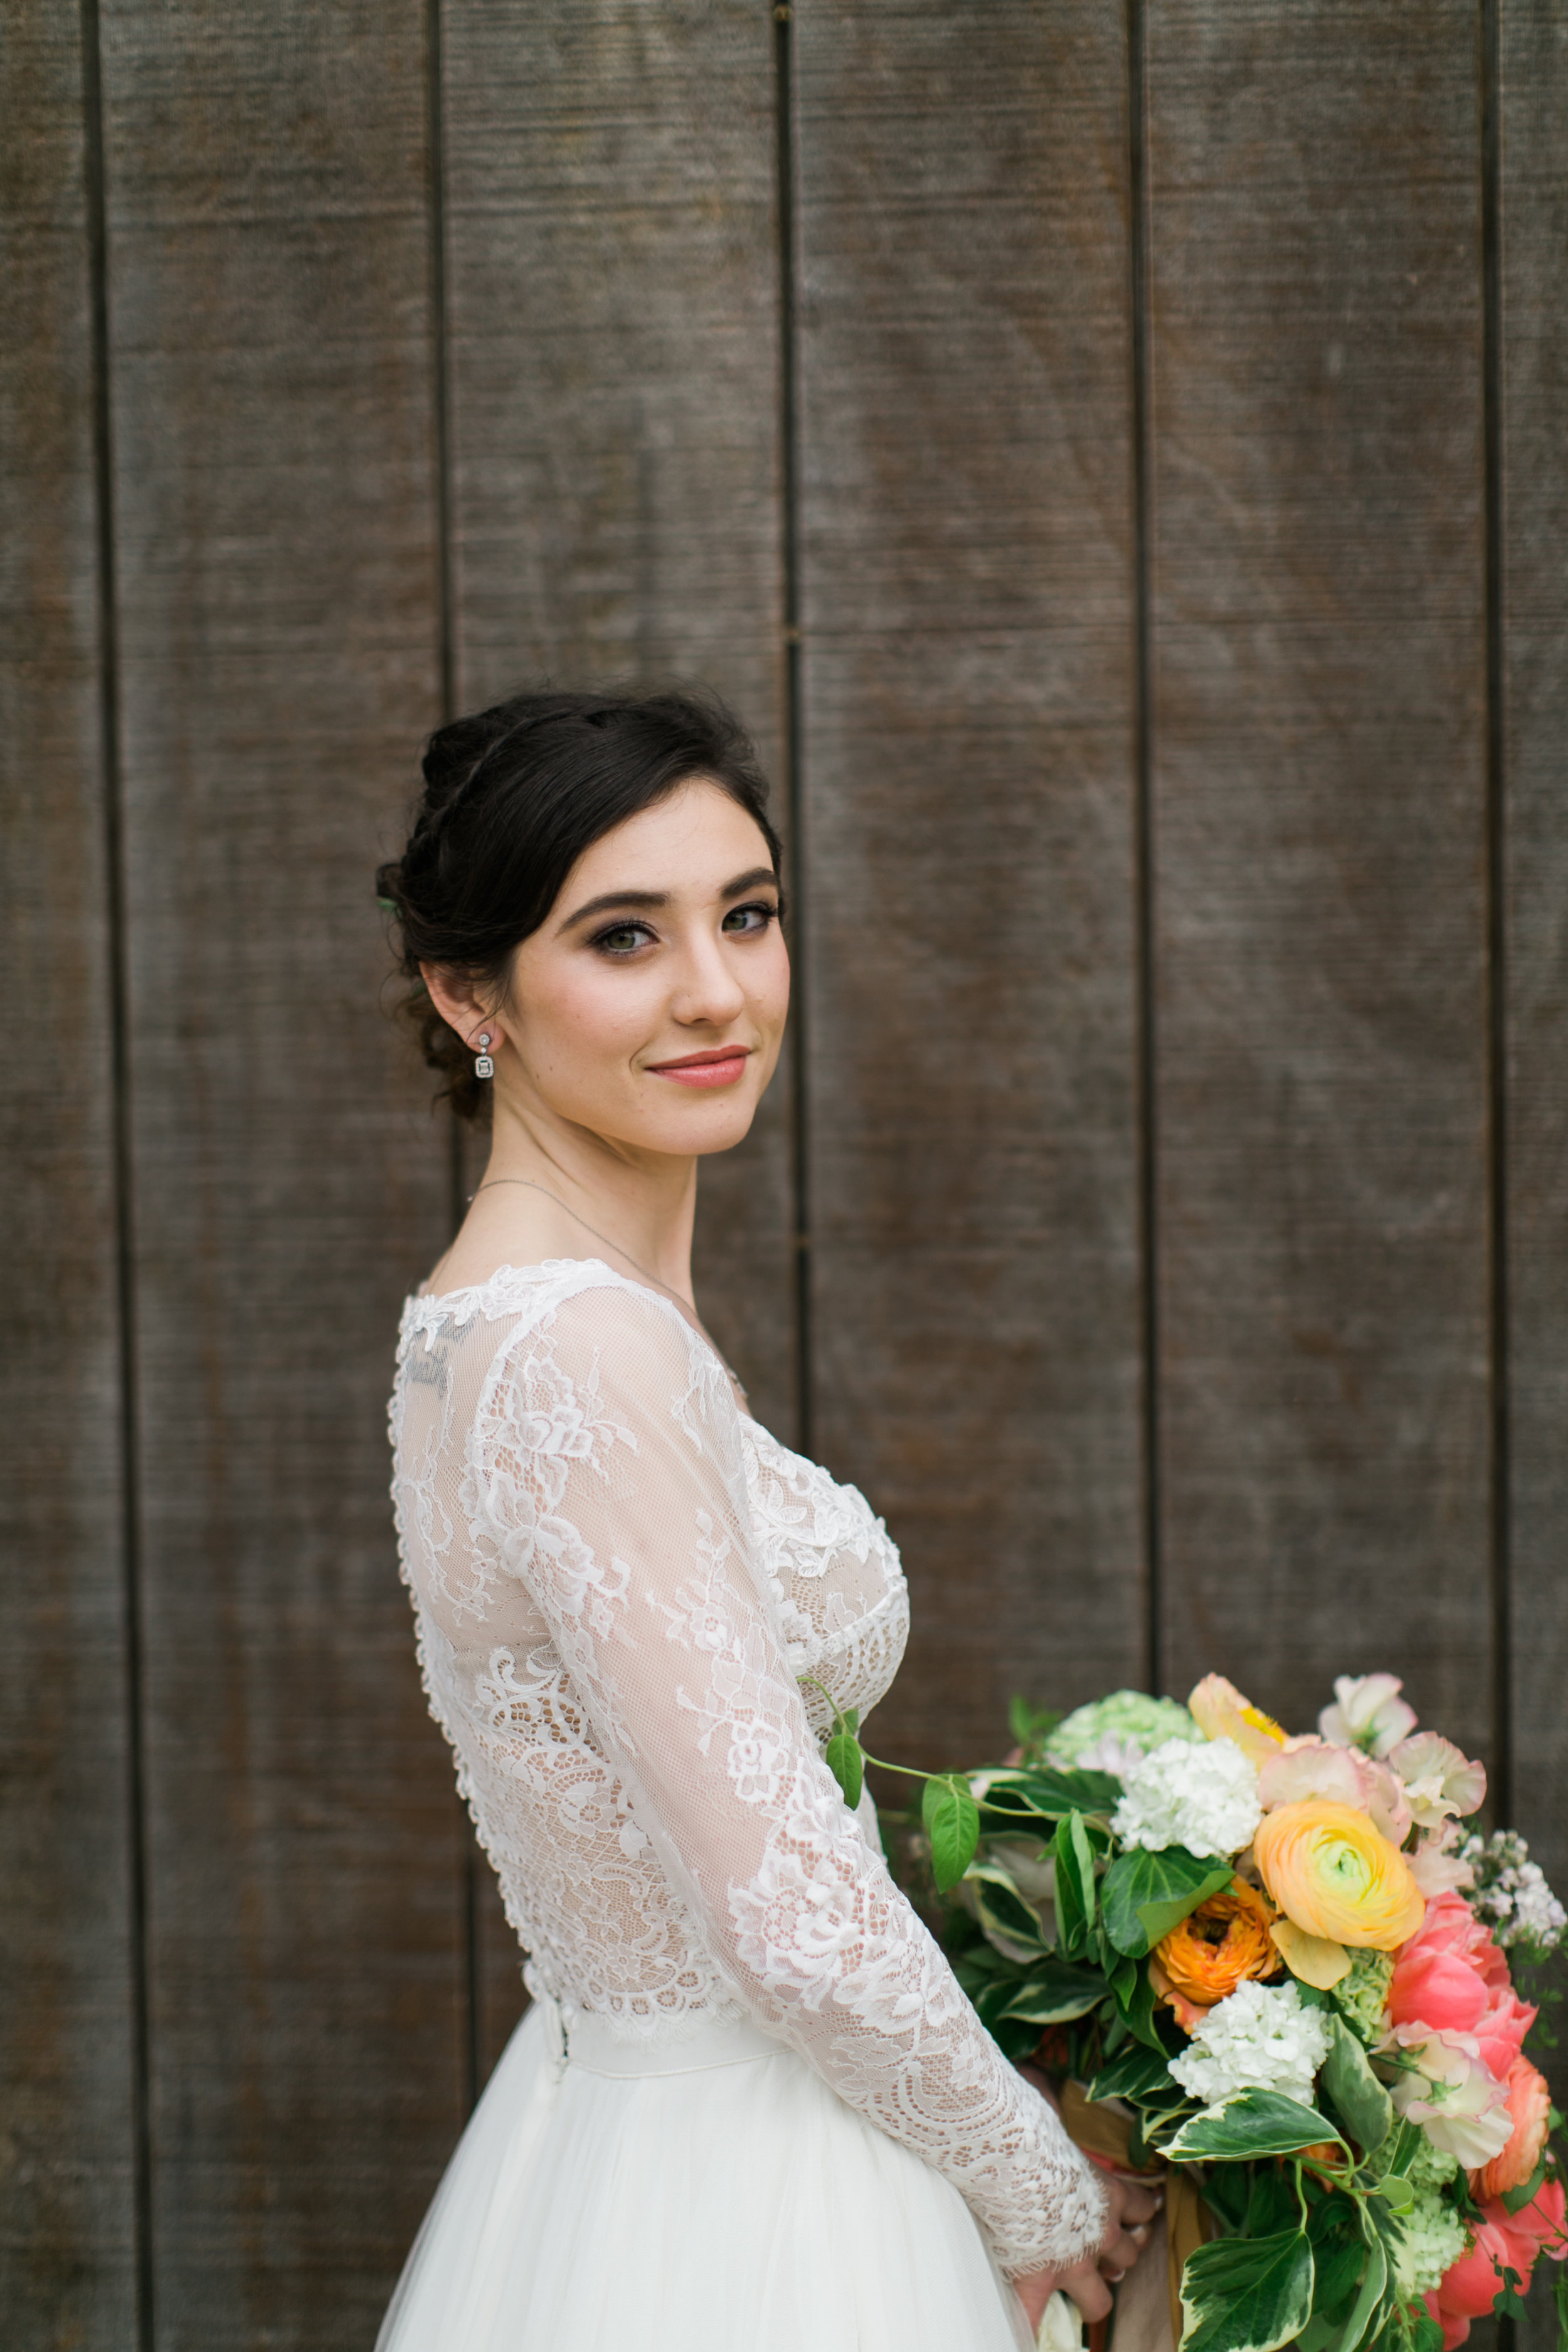 Amarillo wedding coordination and design by Parie Designs